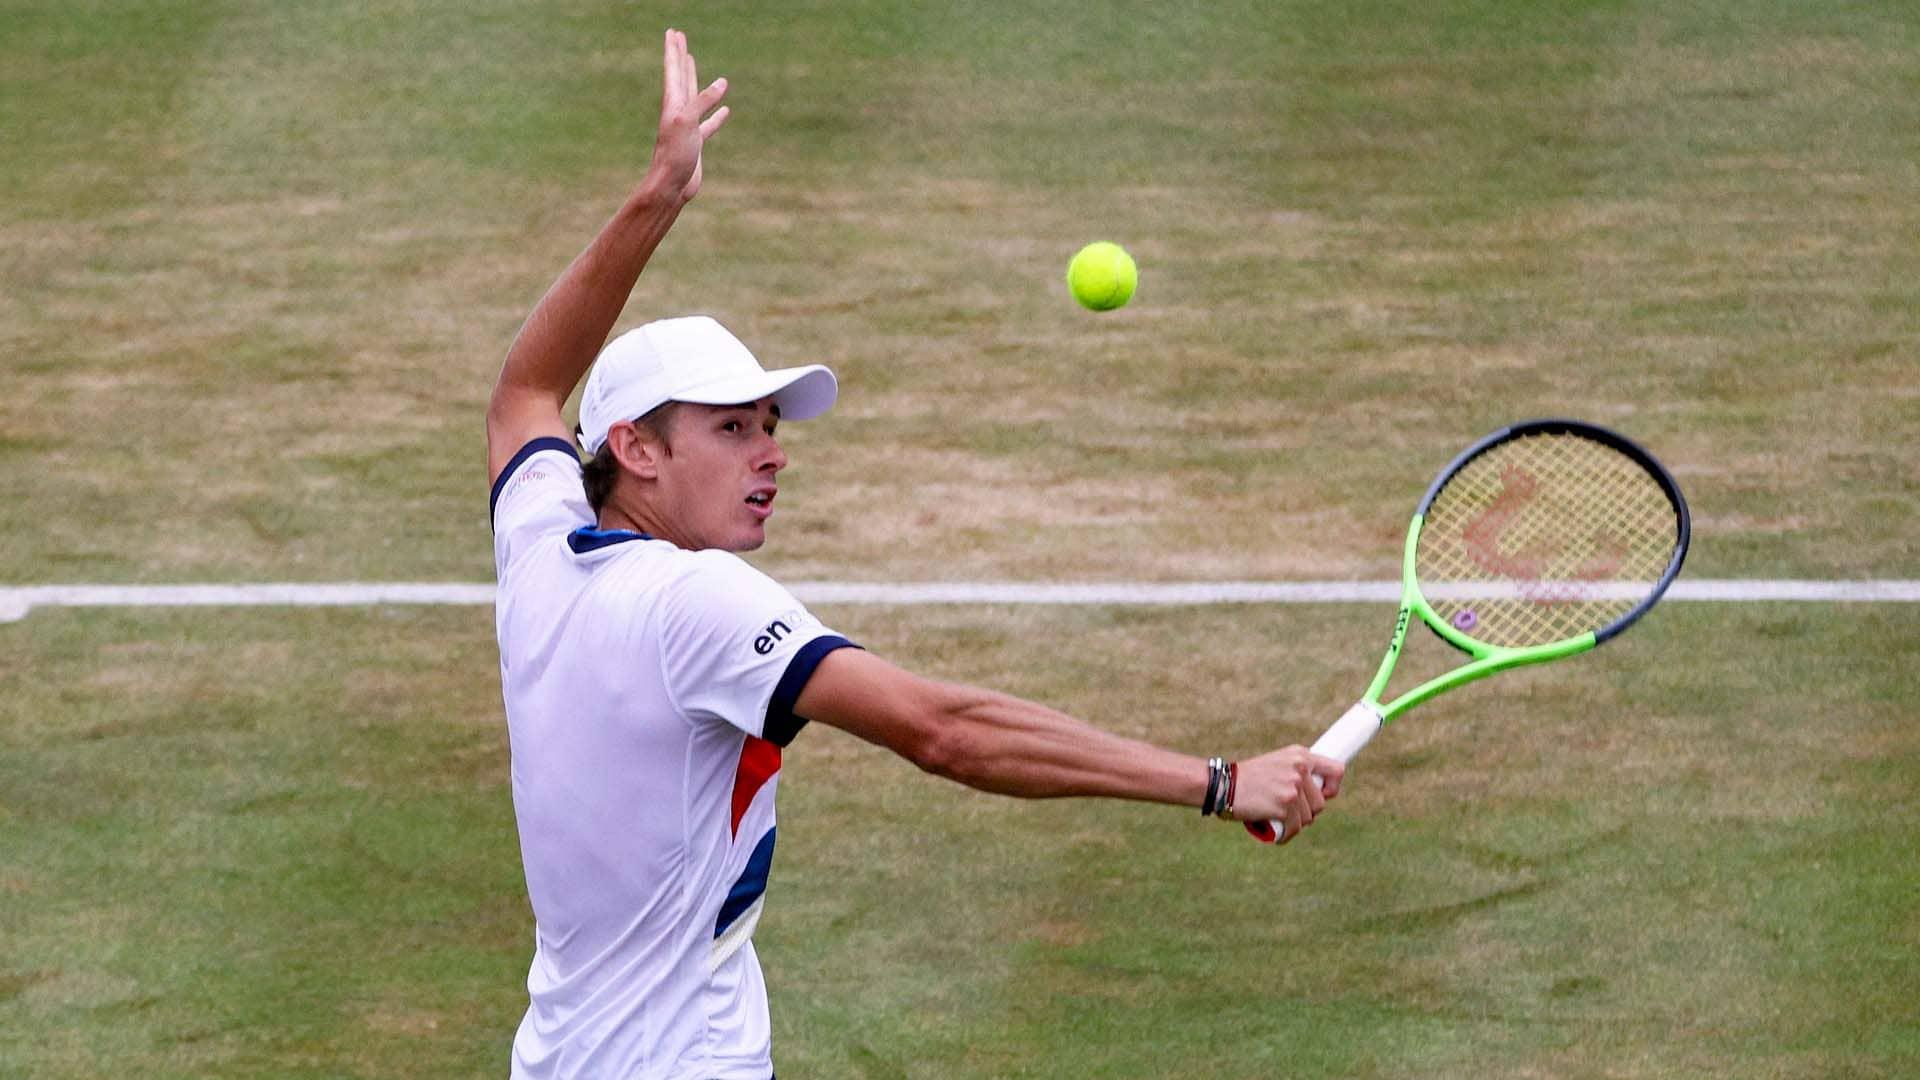 Eastbourne Open 2021: Alex de Minaur vs. Vasek Pospisil Tennis Pick and Prediction